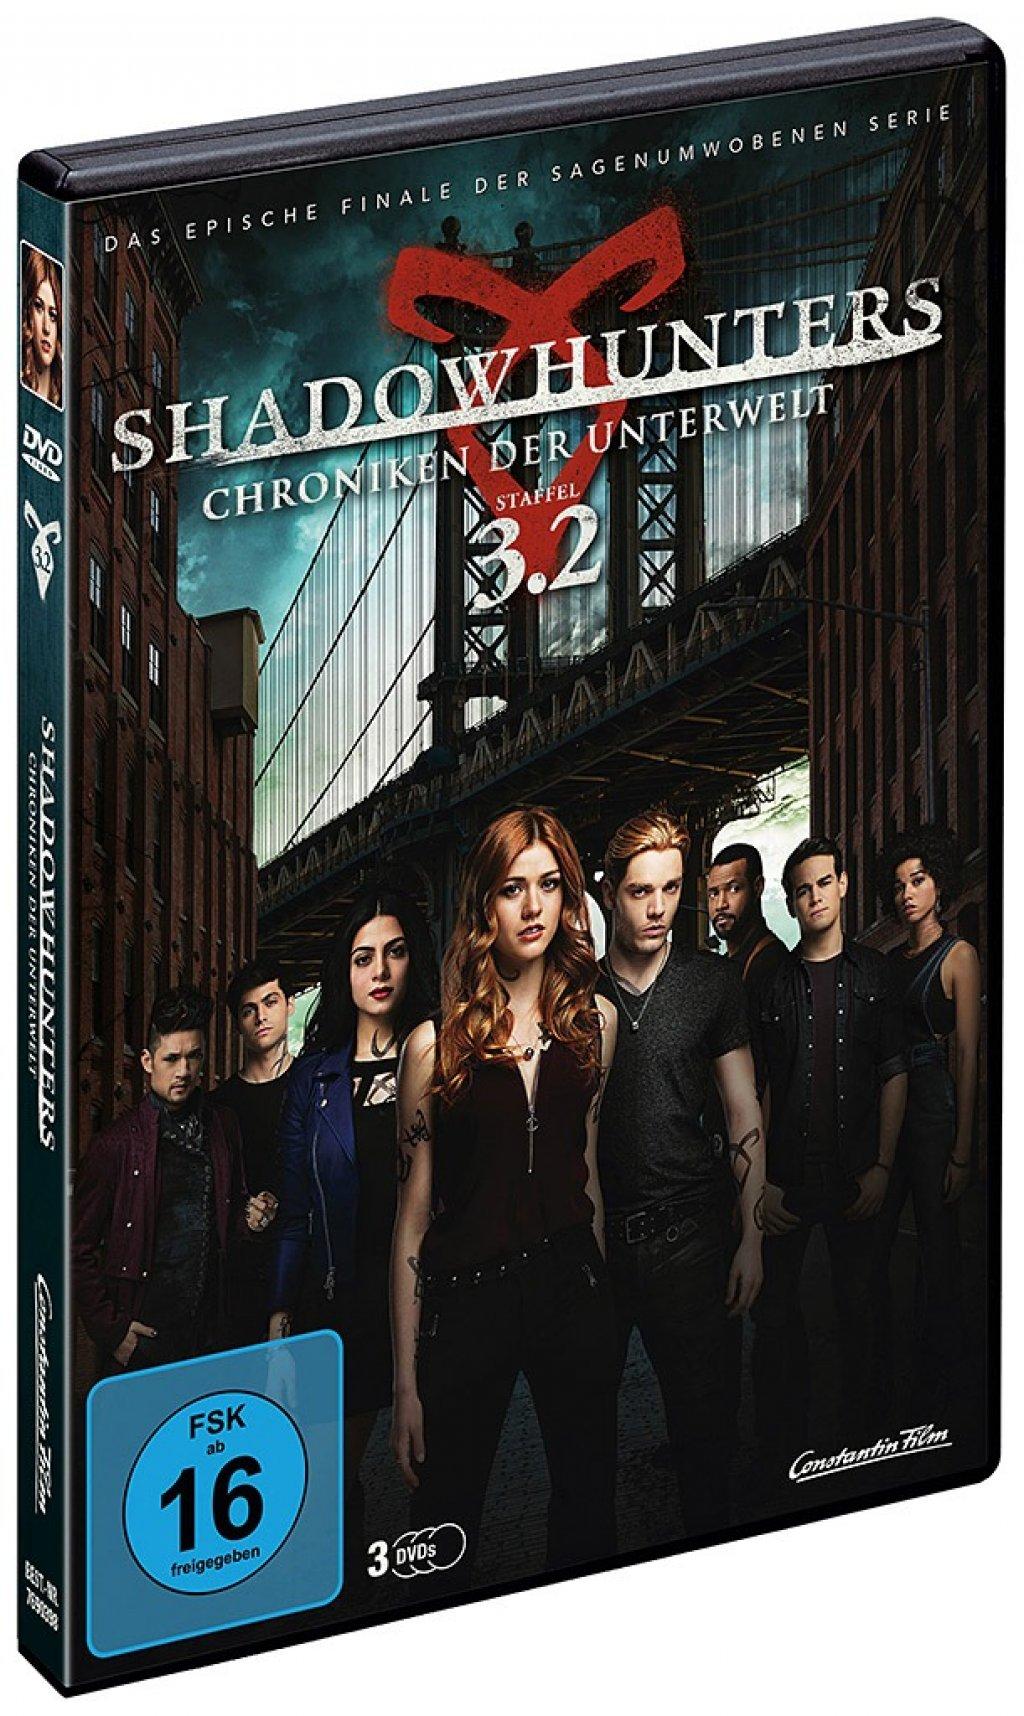 Shadowhunters Staffel 3 Episodenguide